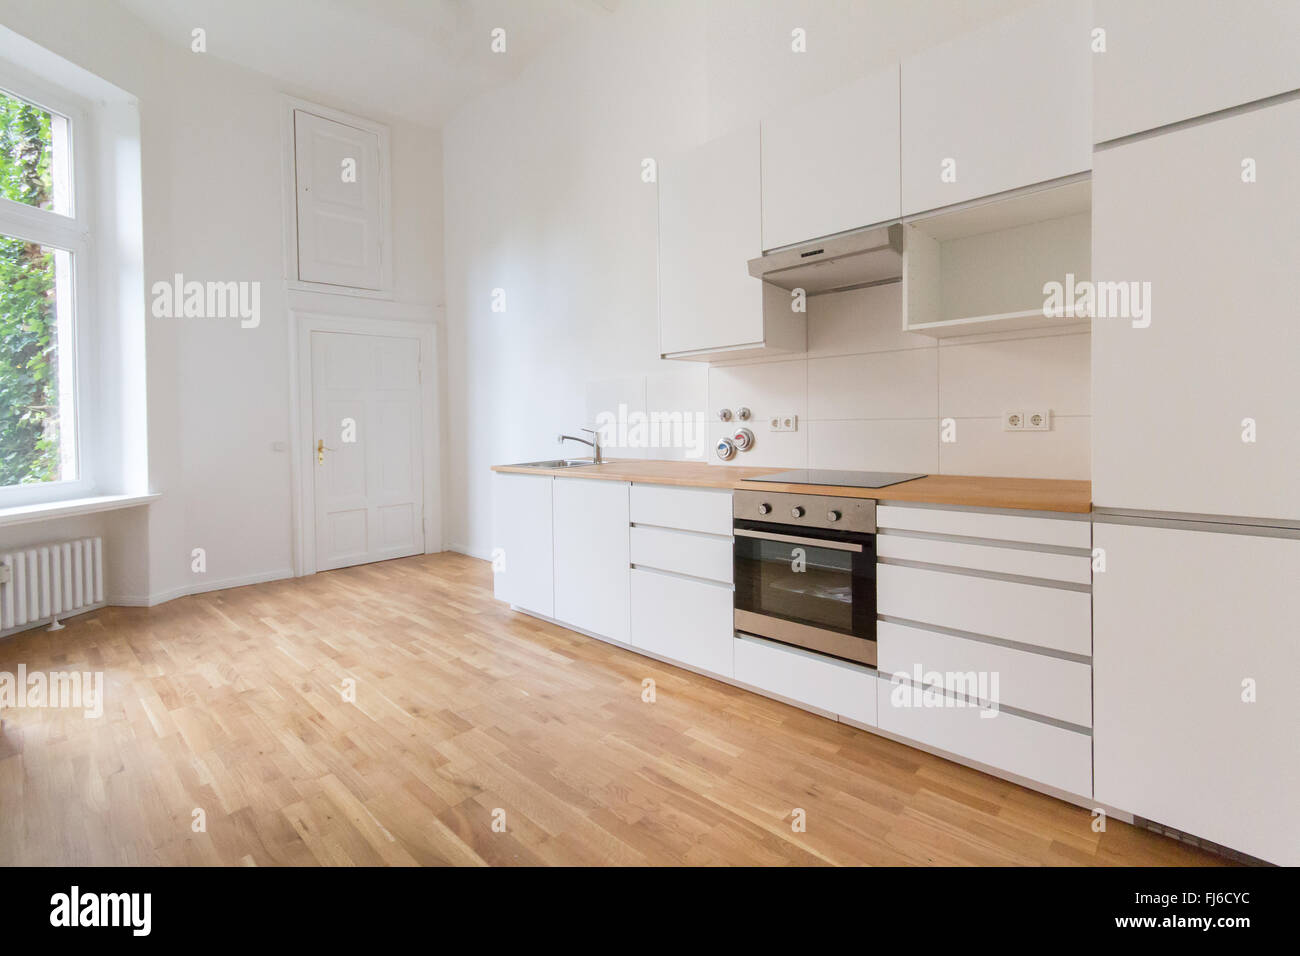 Nuova cucina, fresco appartamento rinnovato, moderna cucina bianca ...